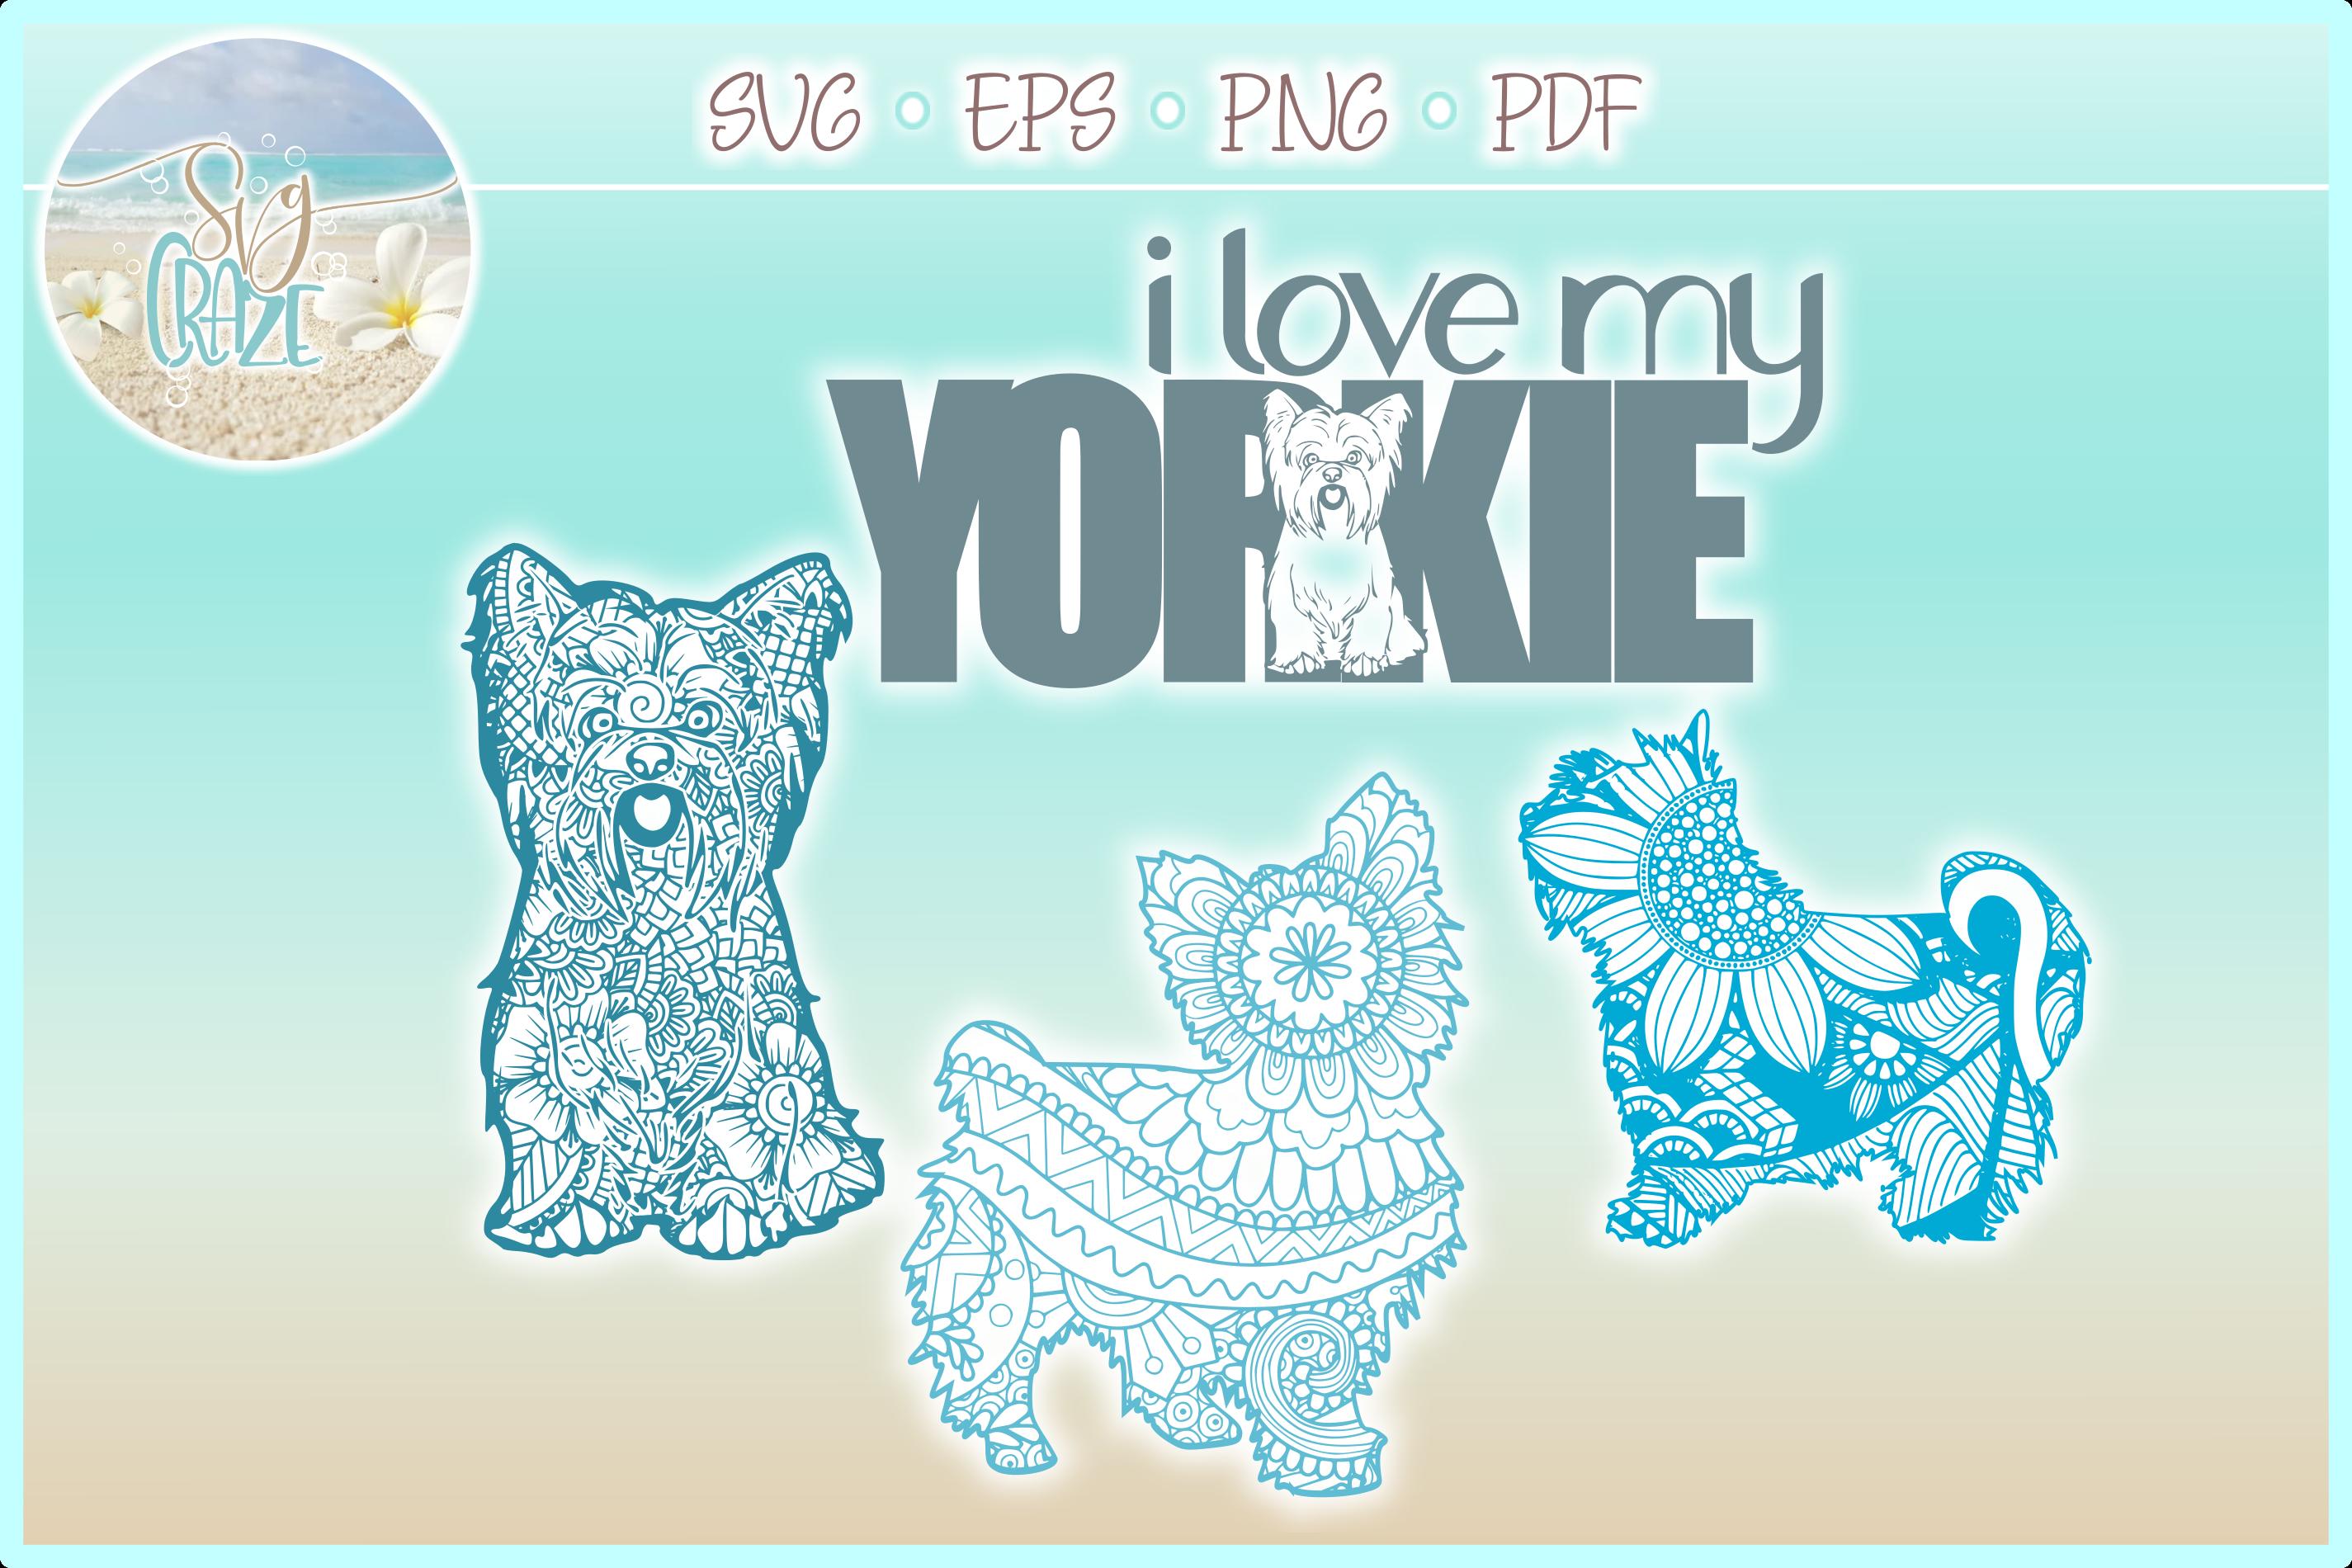 Yorkie Yorkshire Terrier Dog Mandala Zentangle Bundle SVG example image 1